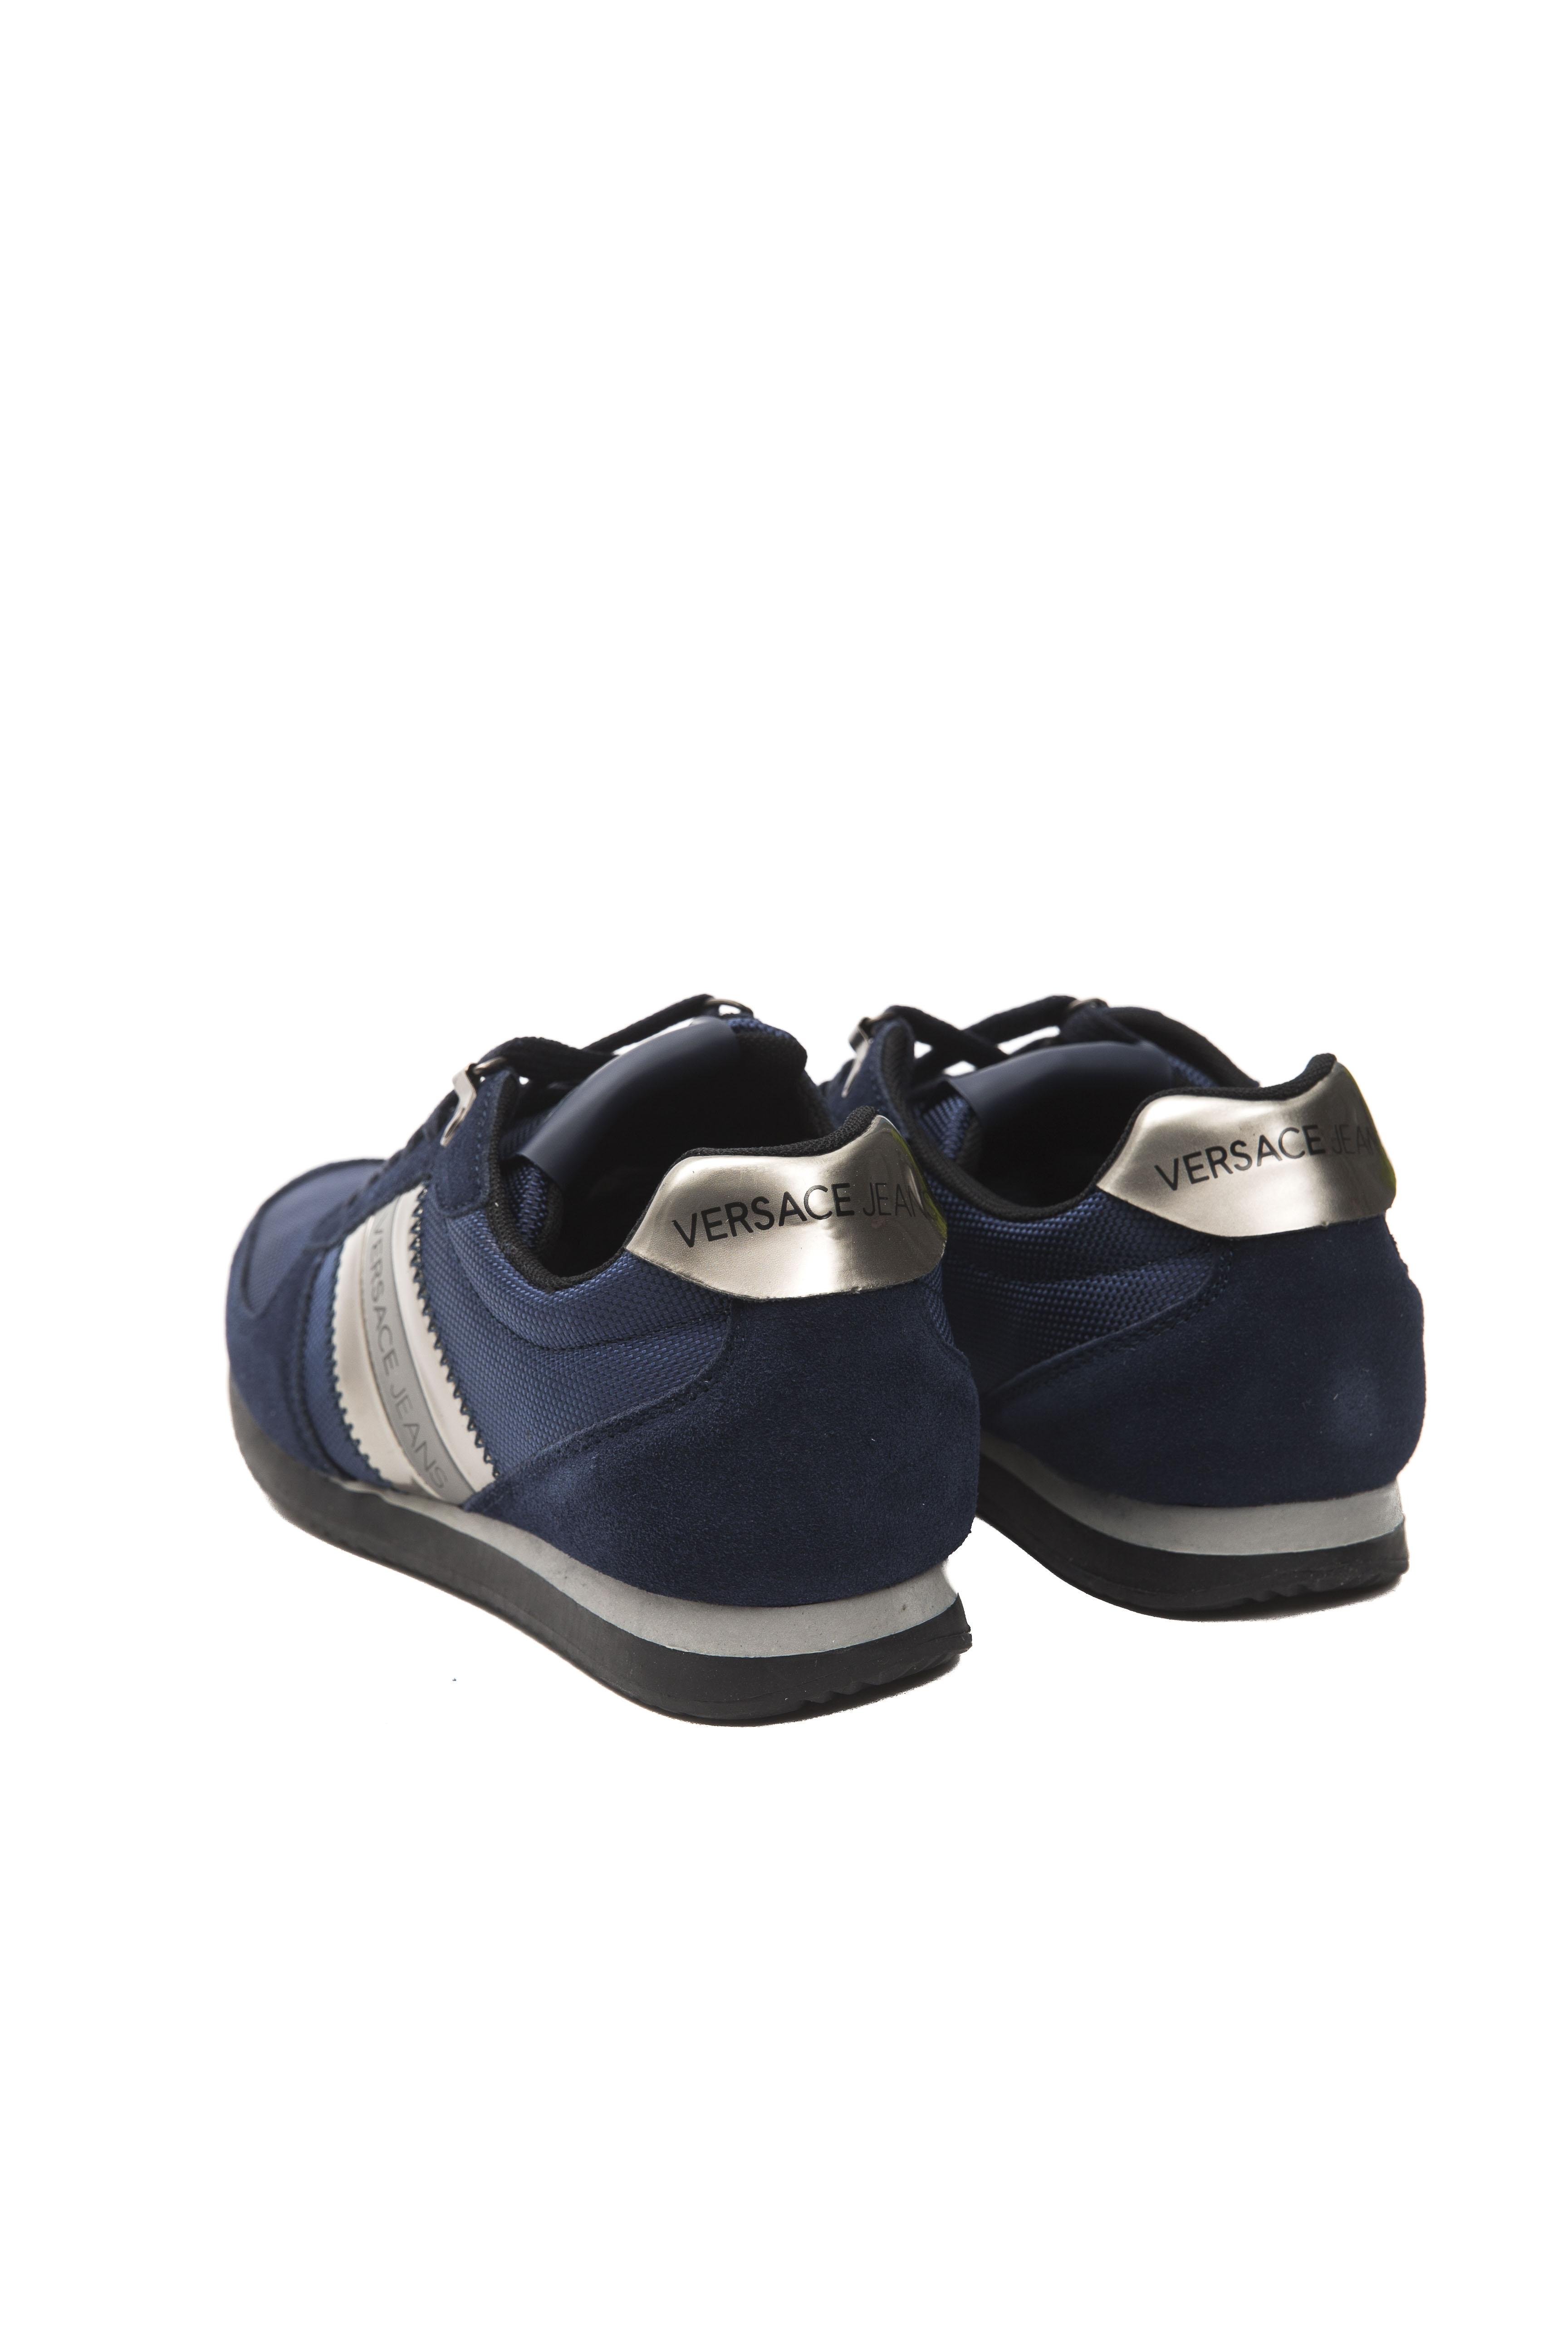 E0yobsa1 Versace Jeans Sneakers Homme Bleu xErBoWQdCe